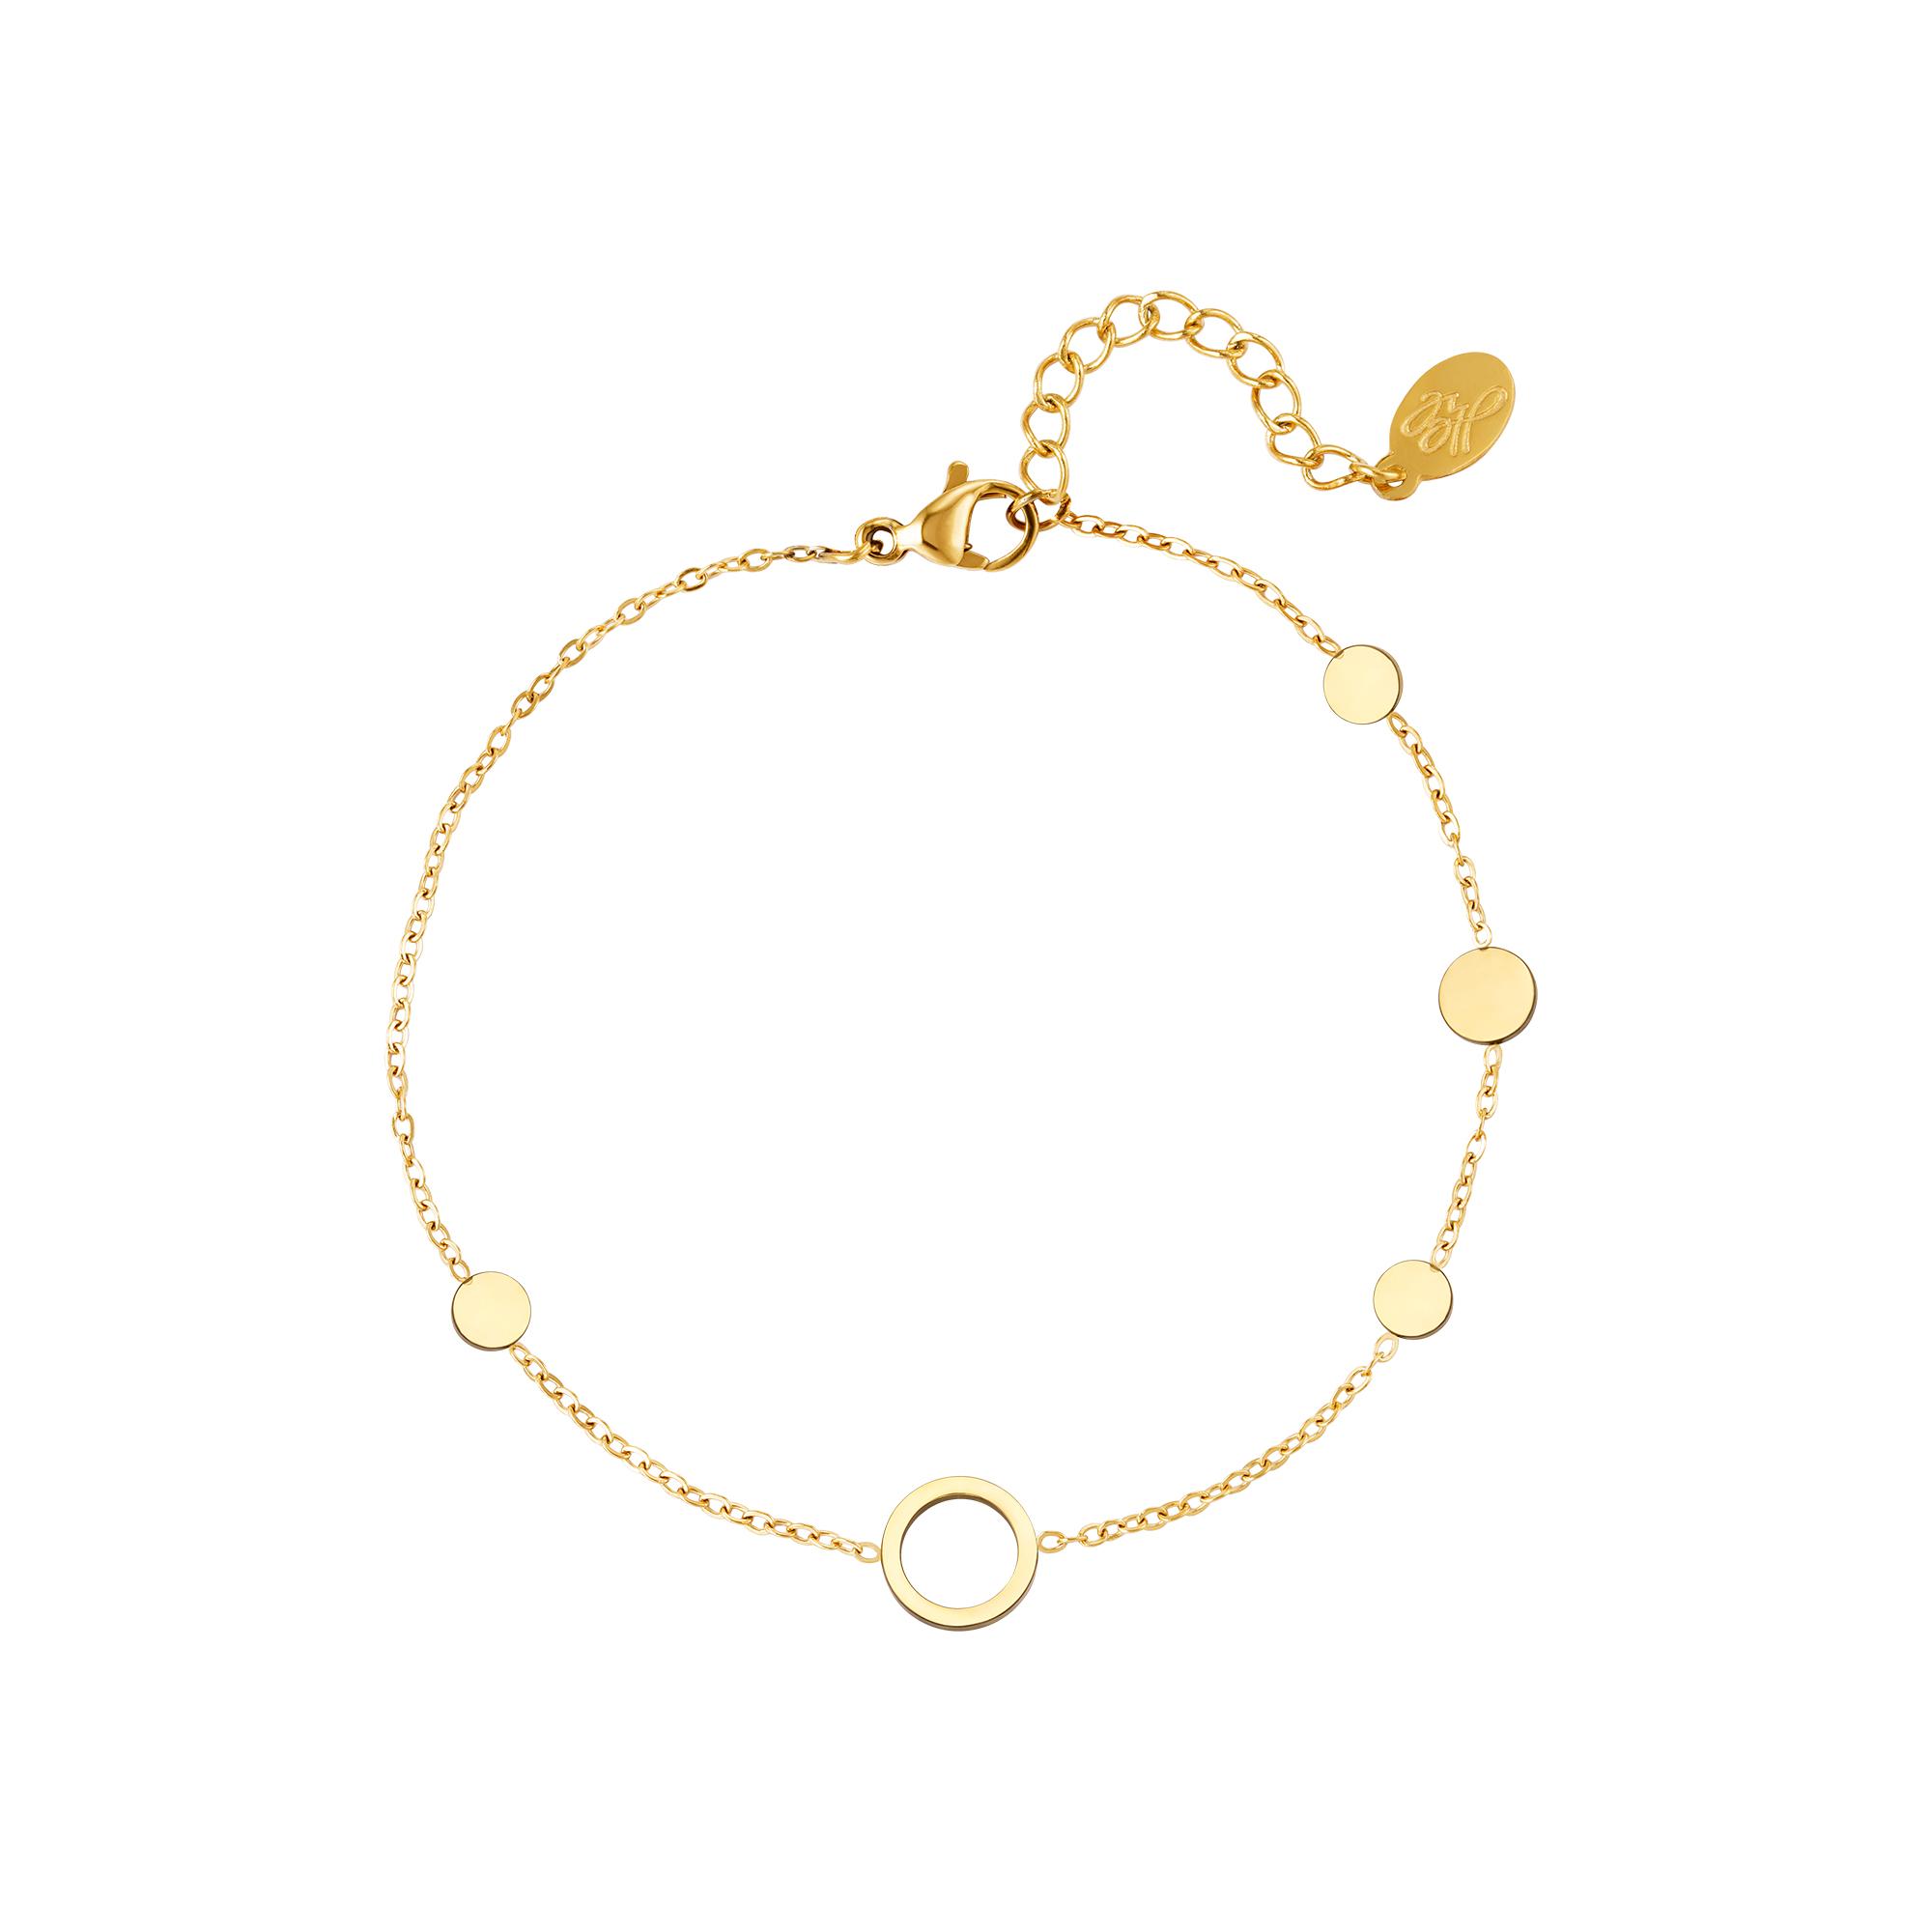 Cercles de bracelet en acier inoxydable